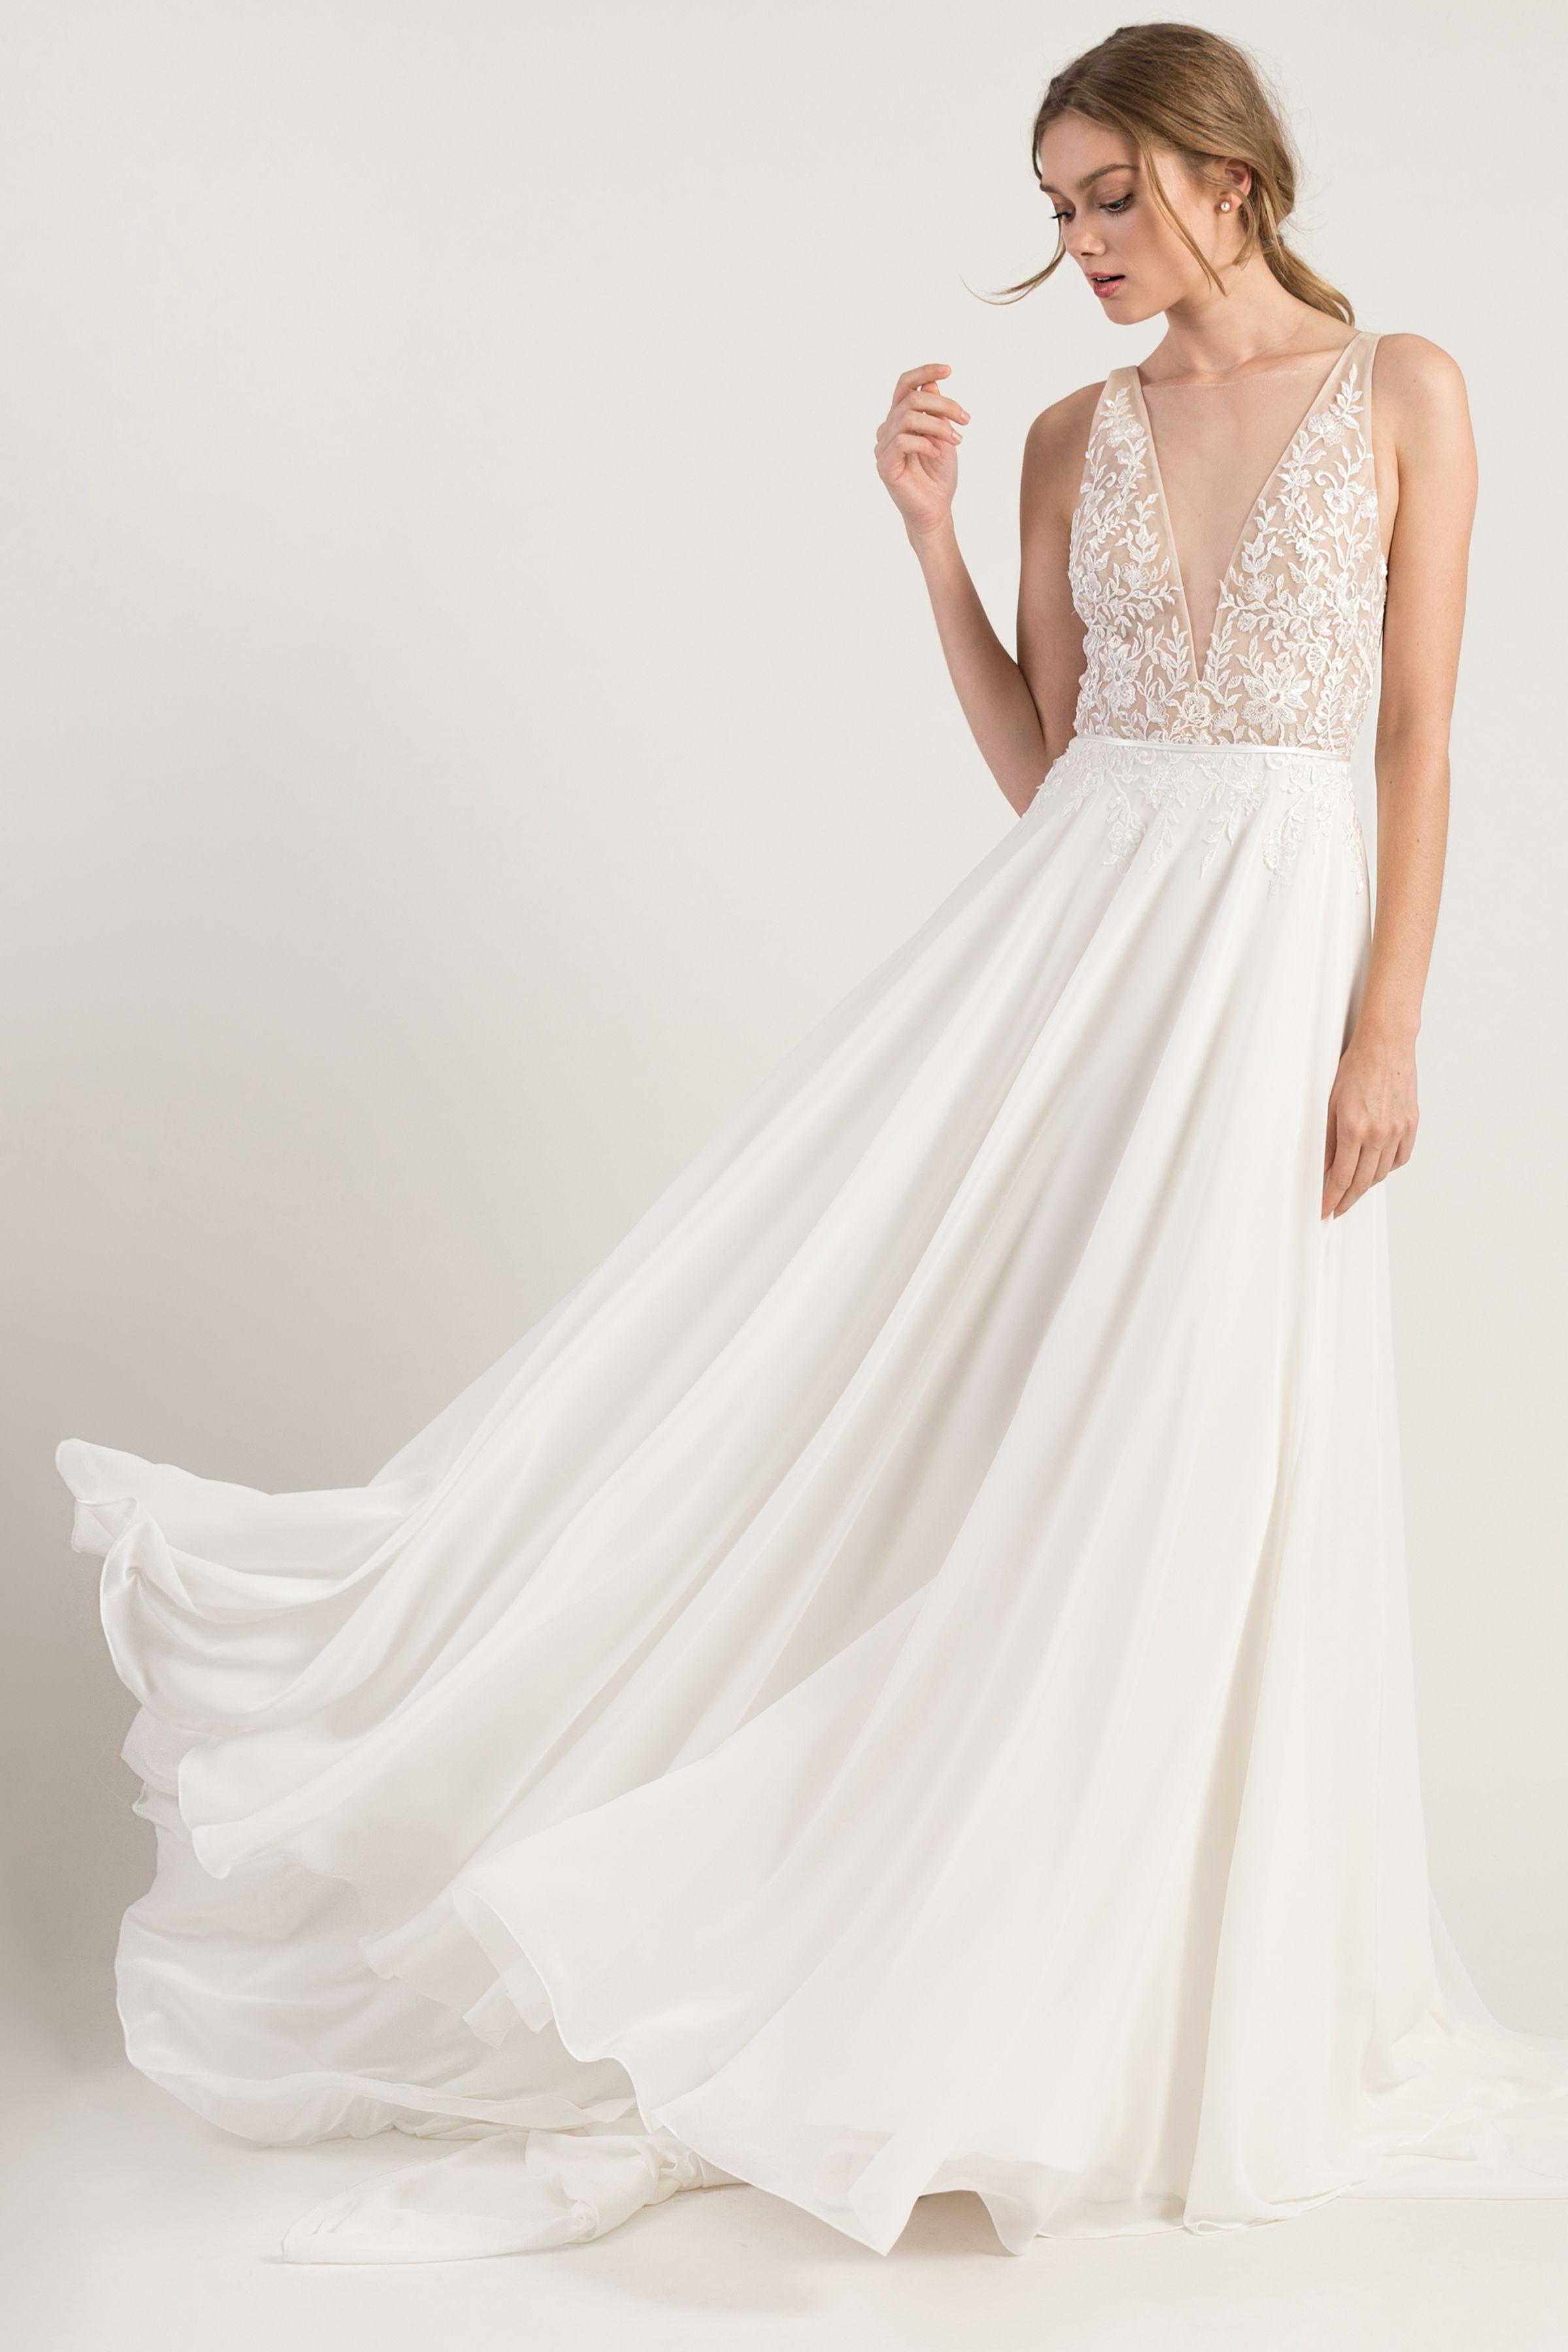 Jenny Yoo Martina Bohemian Chic Wedding Dress